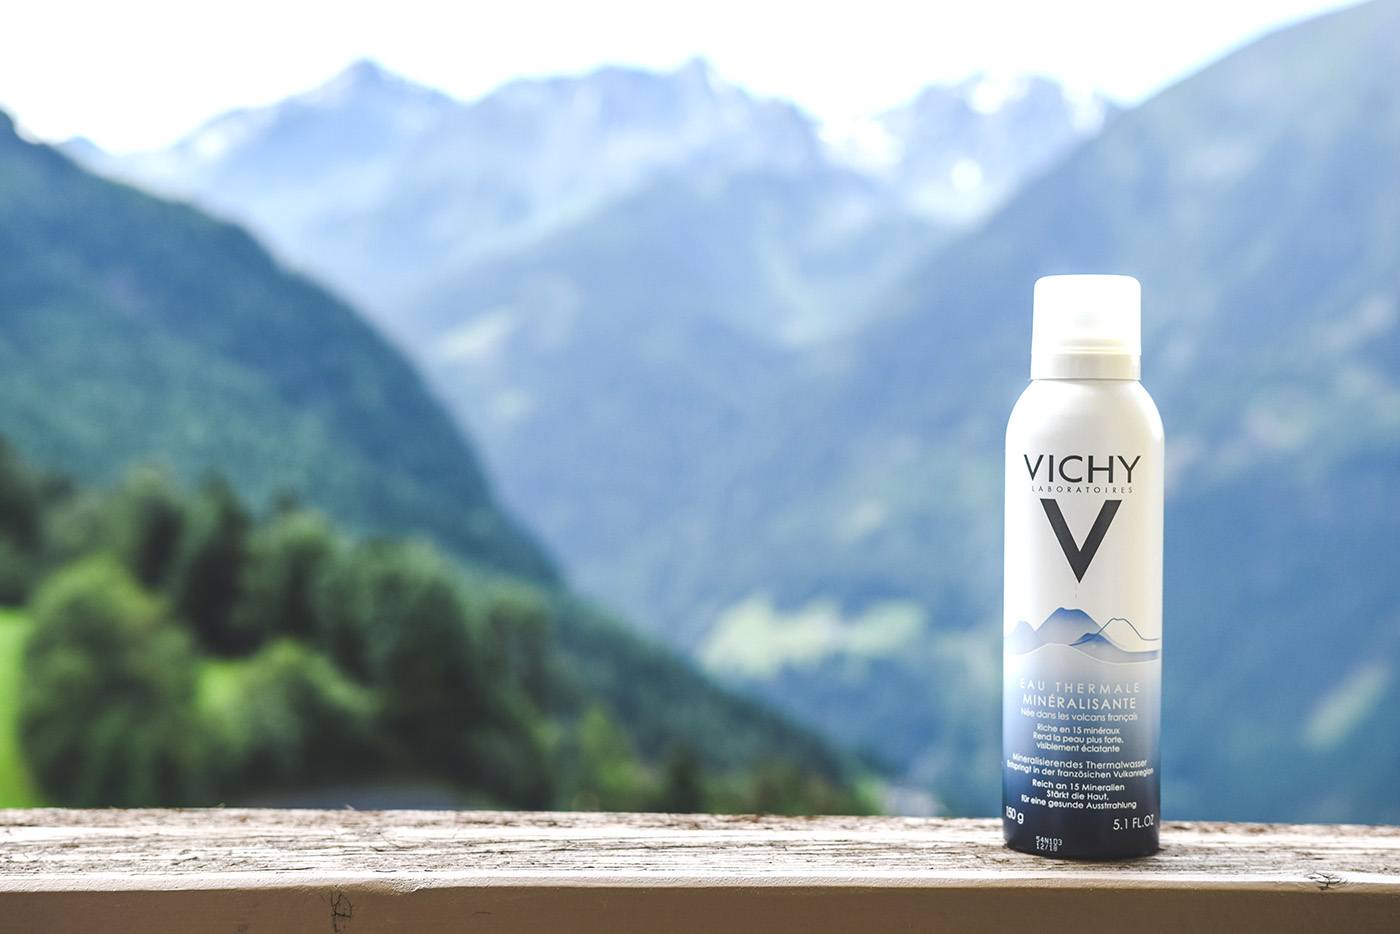 Vichy_5Lieblinge-5klwin